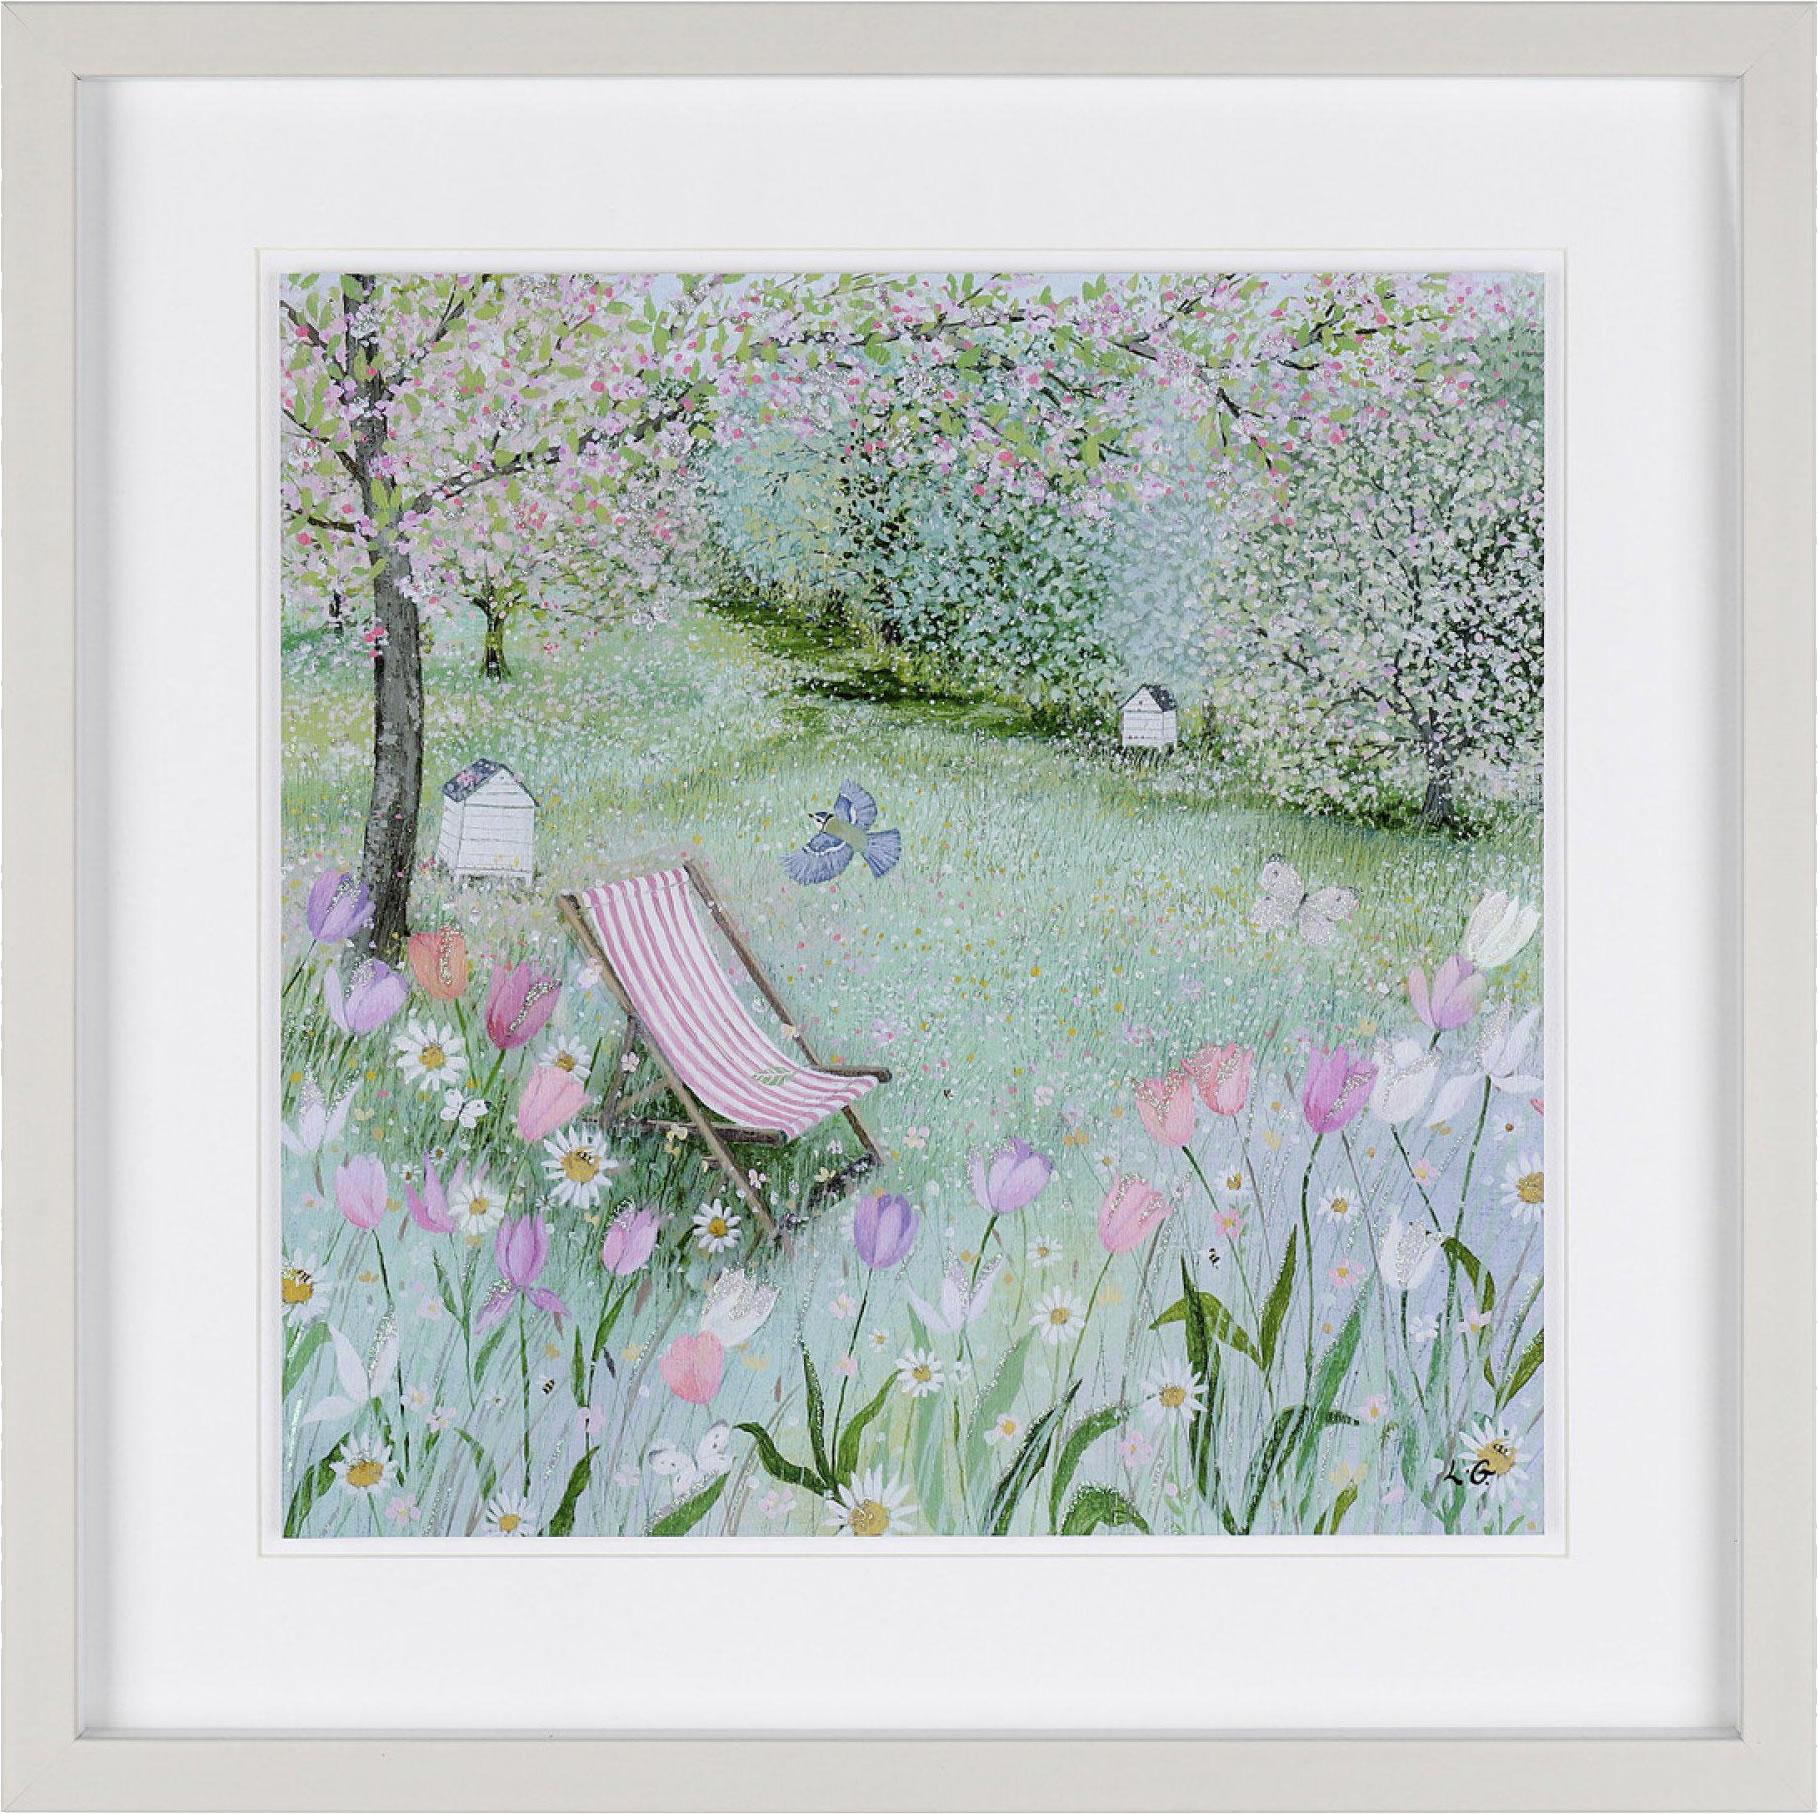 Garden Framed Art Print For Sale - Quiet Place - Deck Chair - Surrounds Gallery West Byfleet Surrey